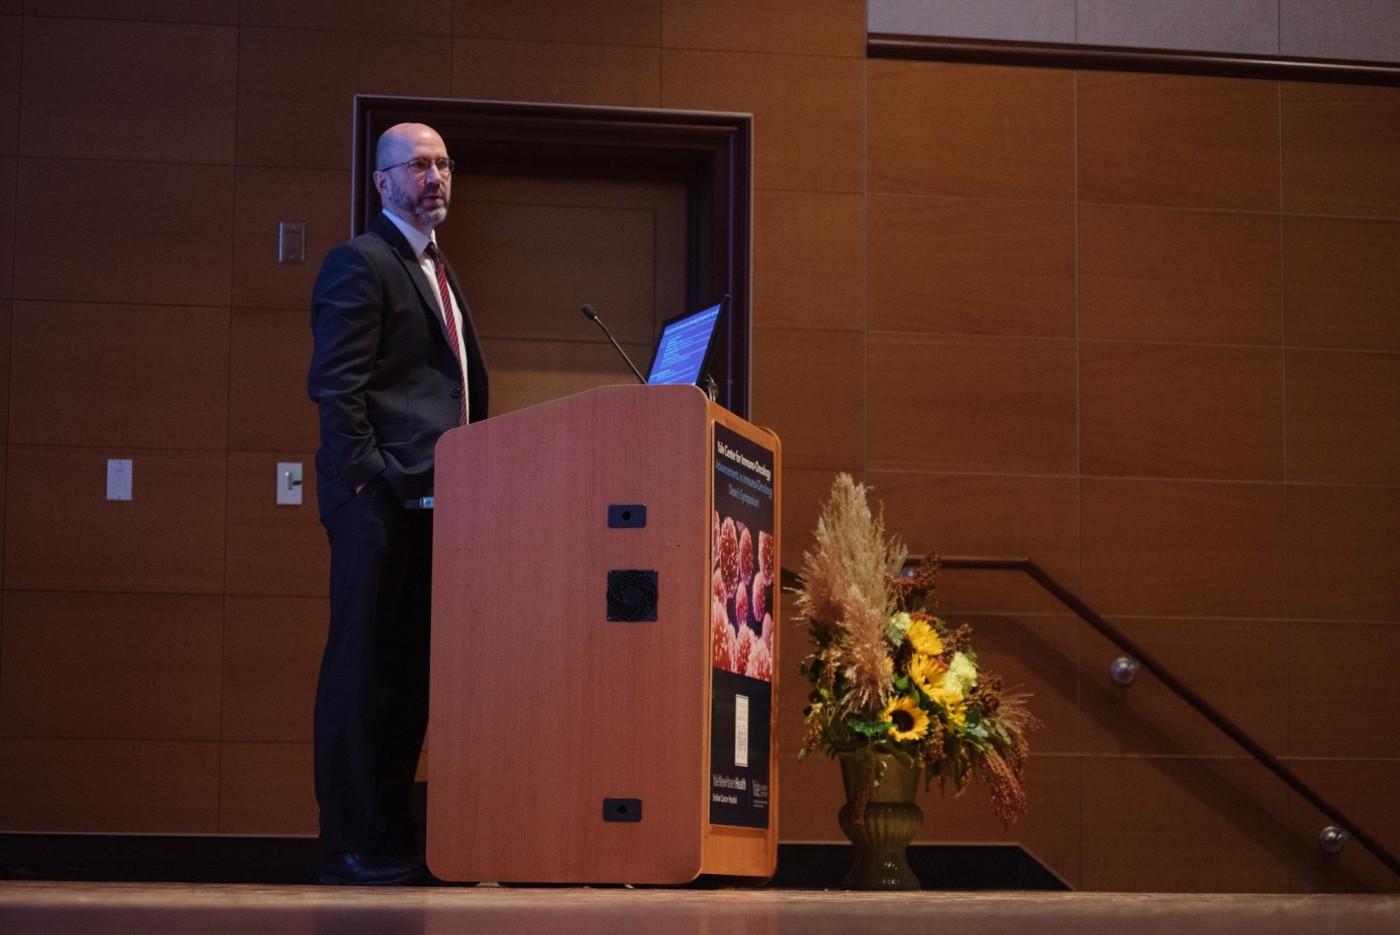 marcus bosenberg at podium speaking